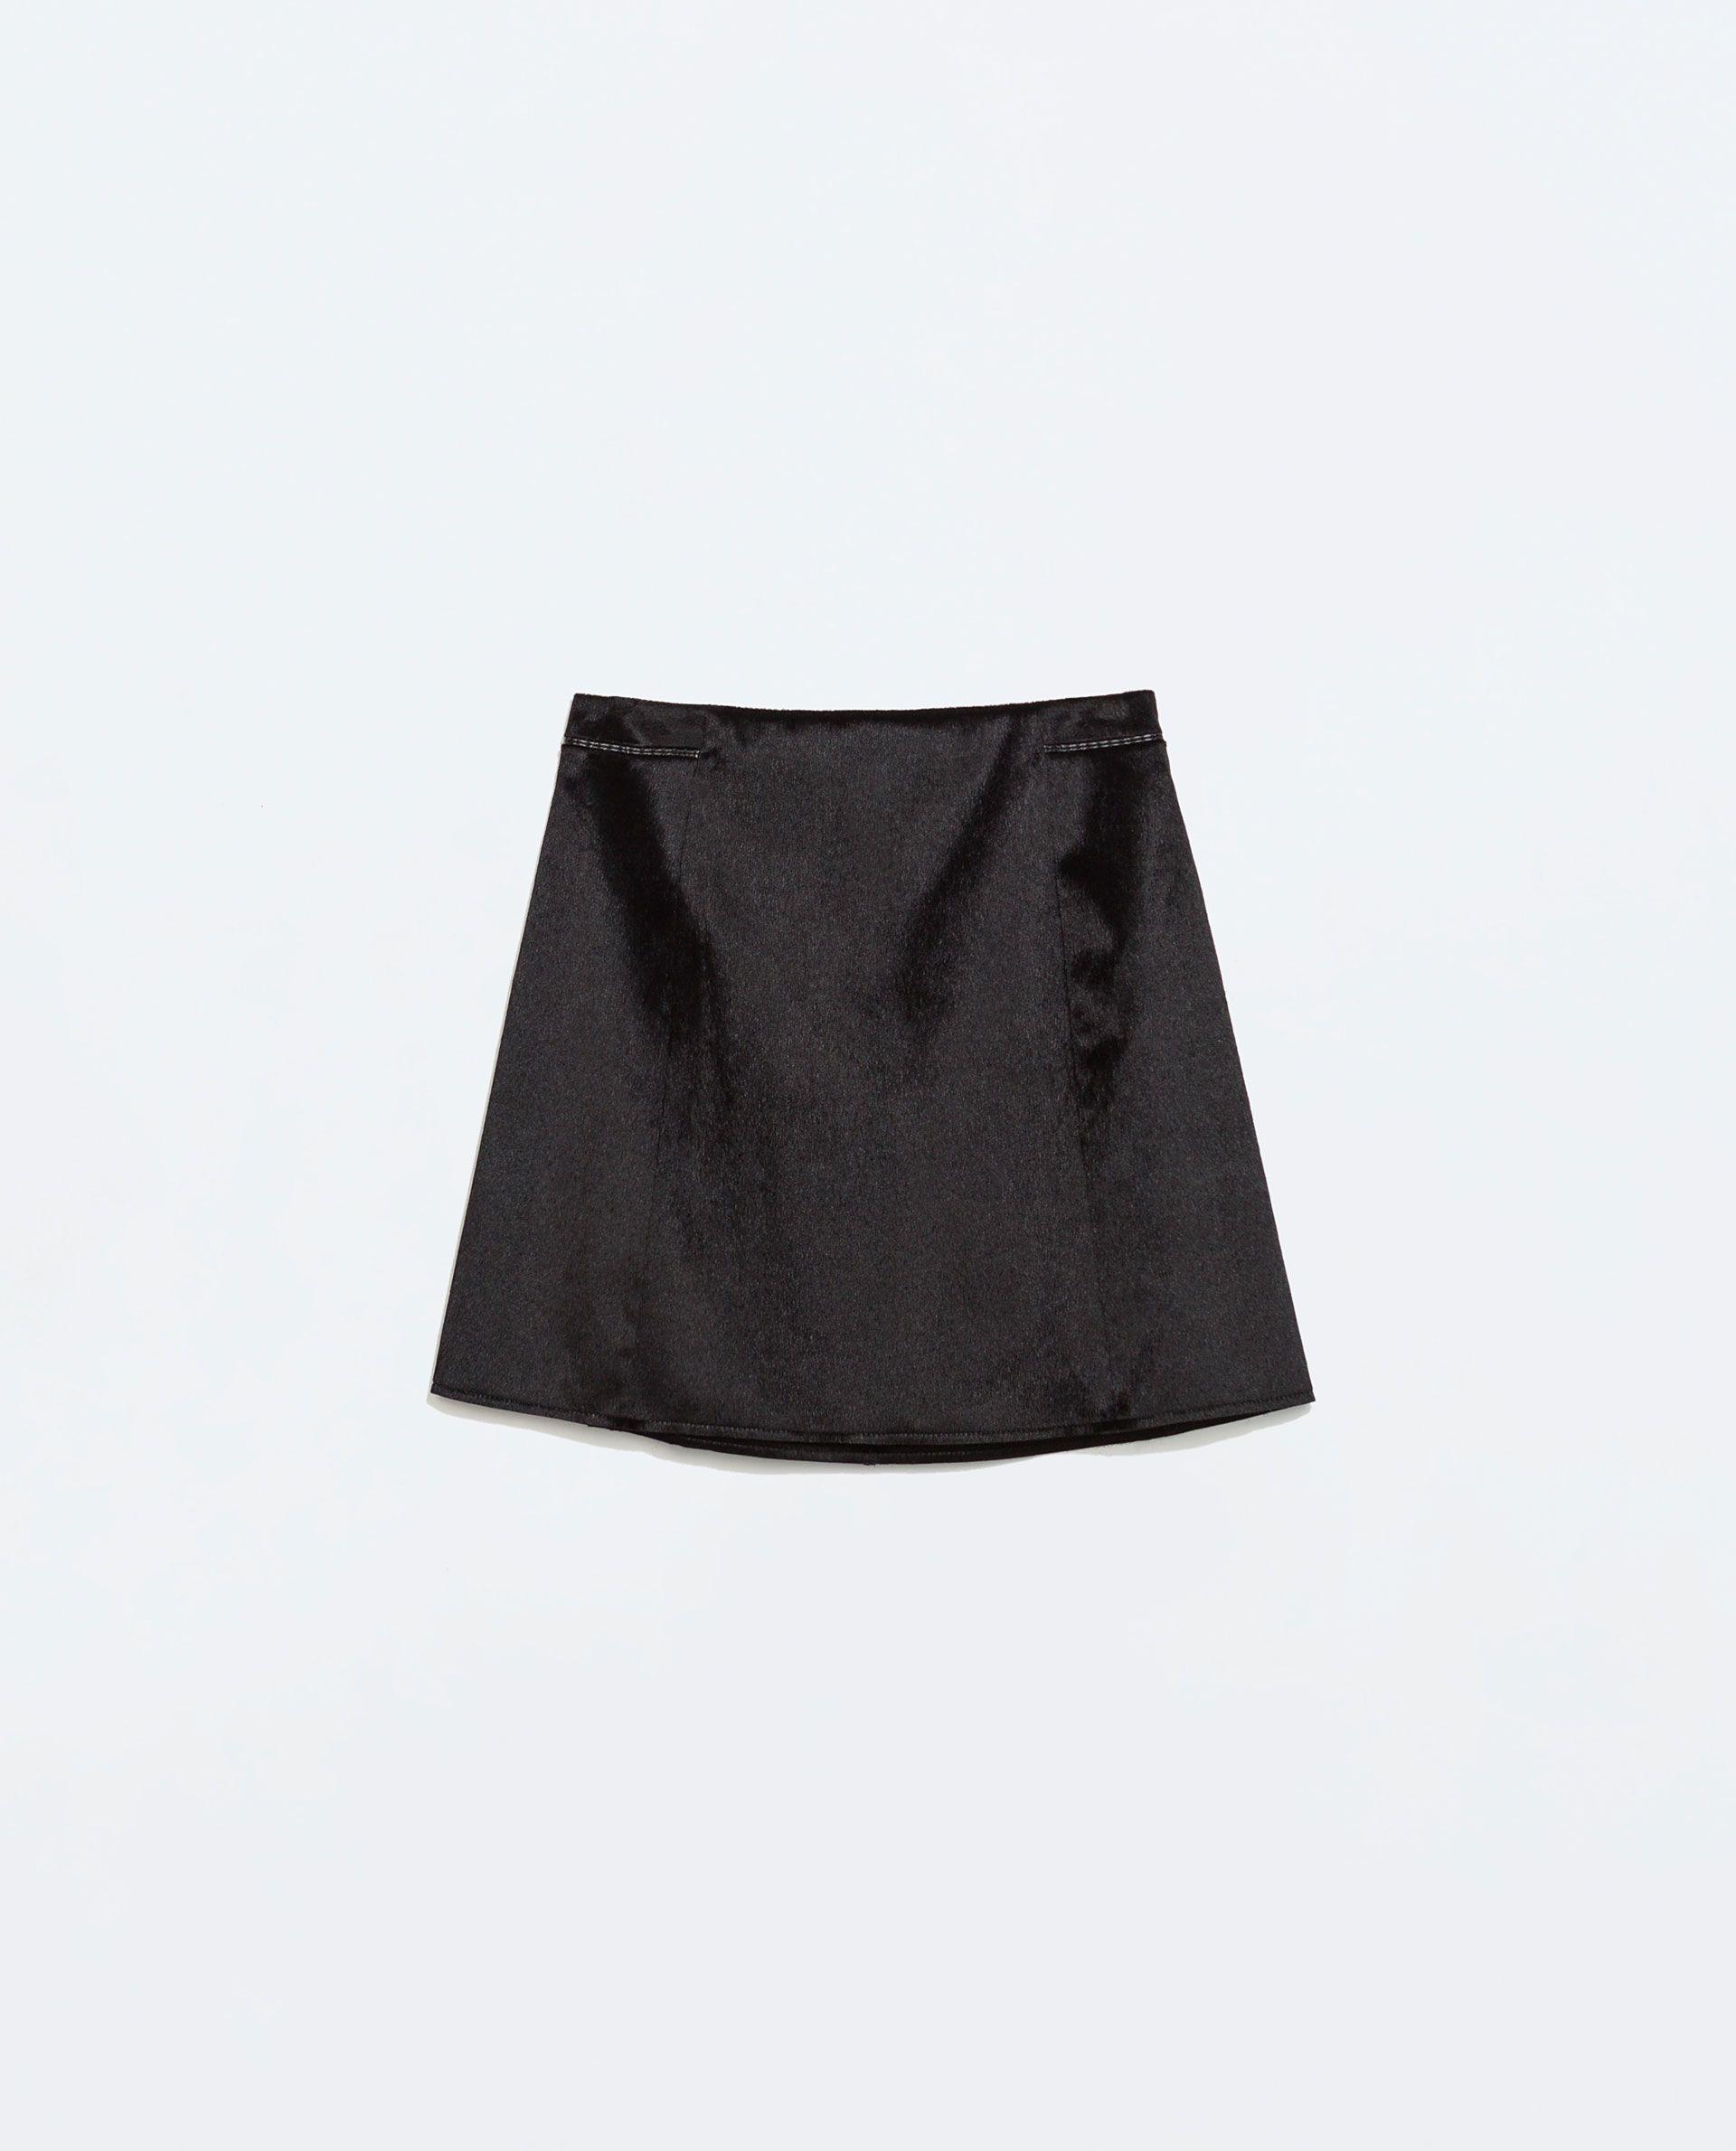 bb49e1d5 ZARA - WOMAN - TEXTURED A-LINE MINI SKIRT | Things to Wear | Zara ...